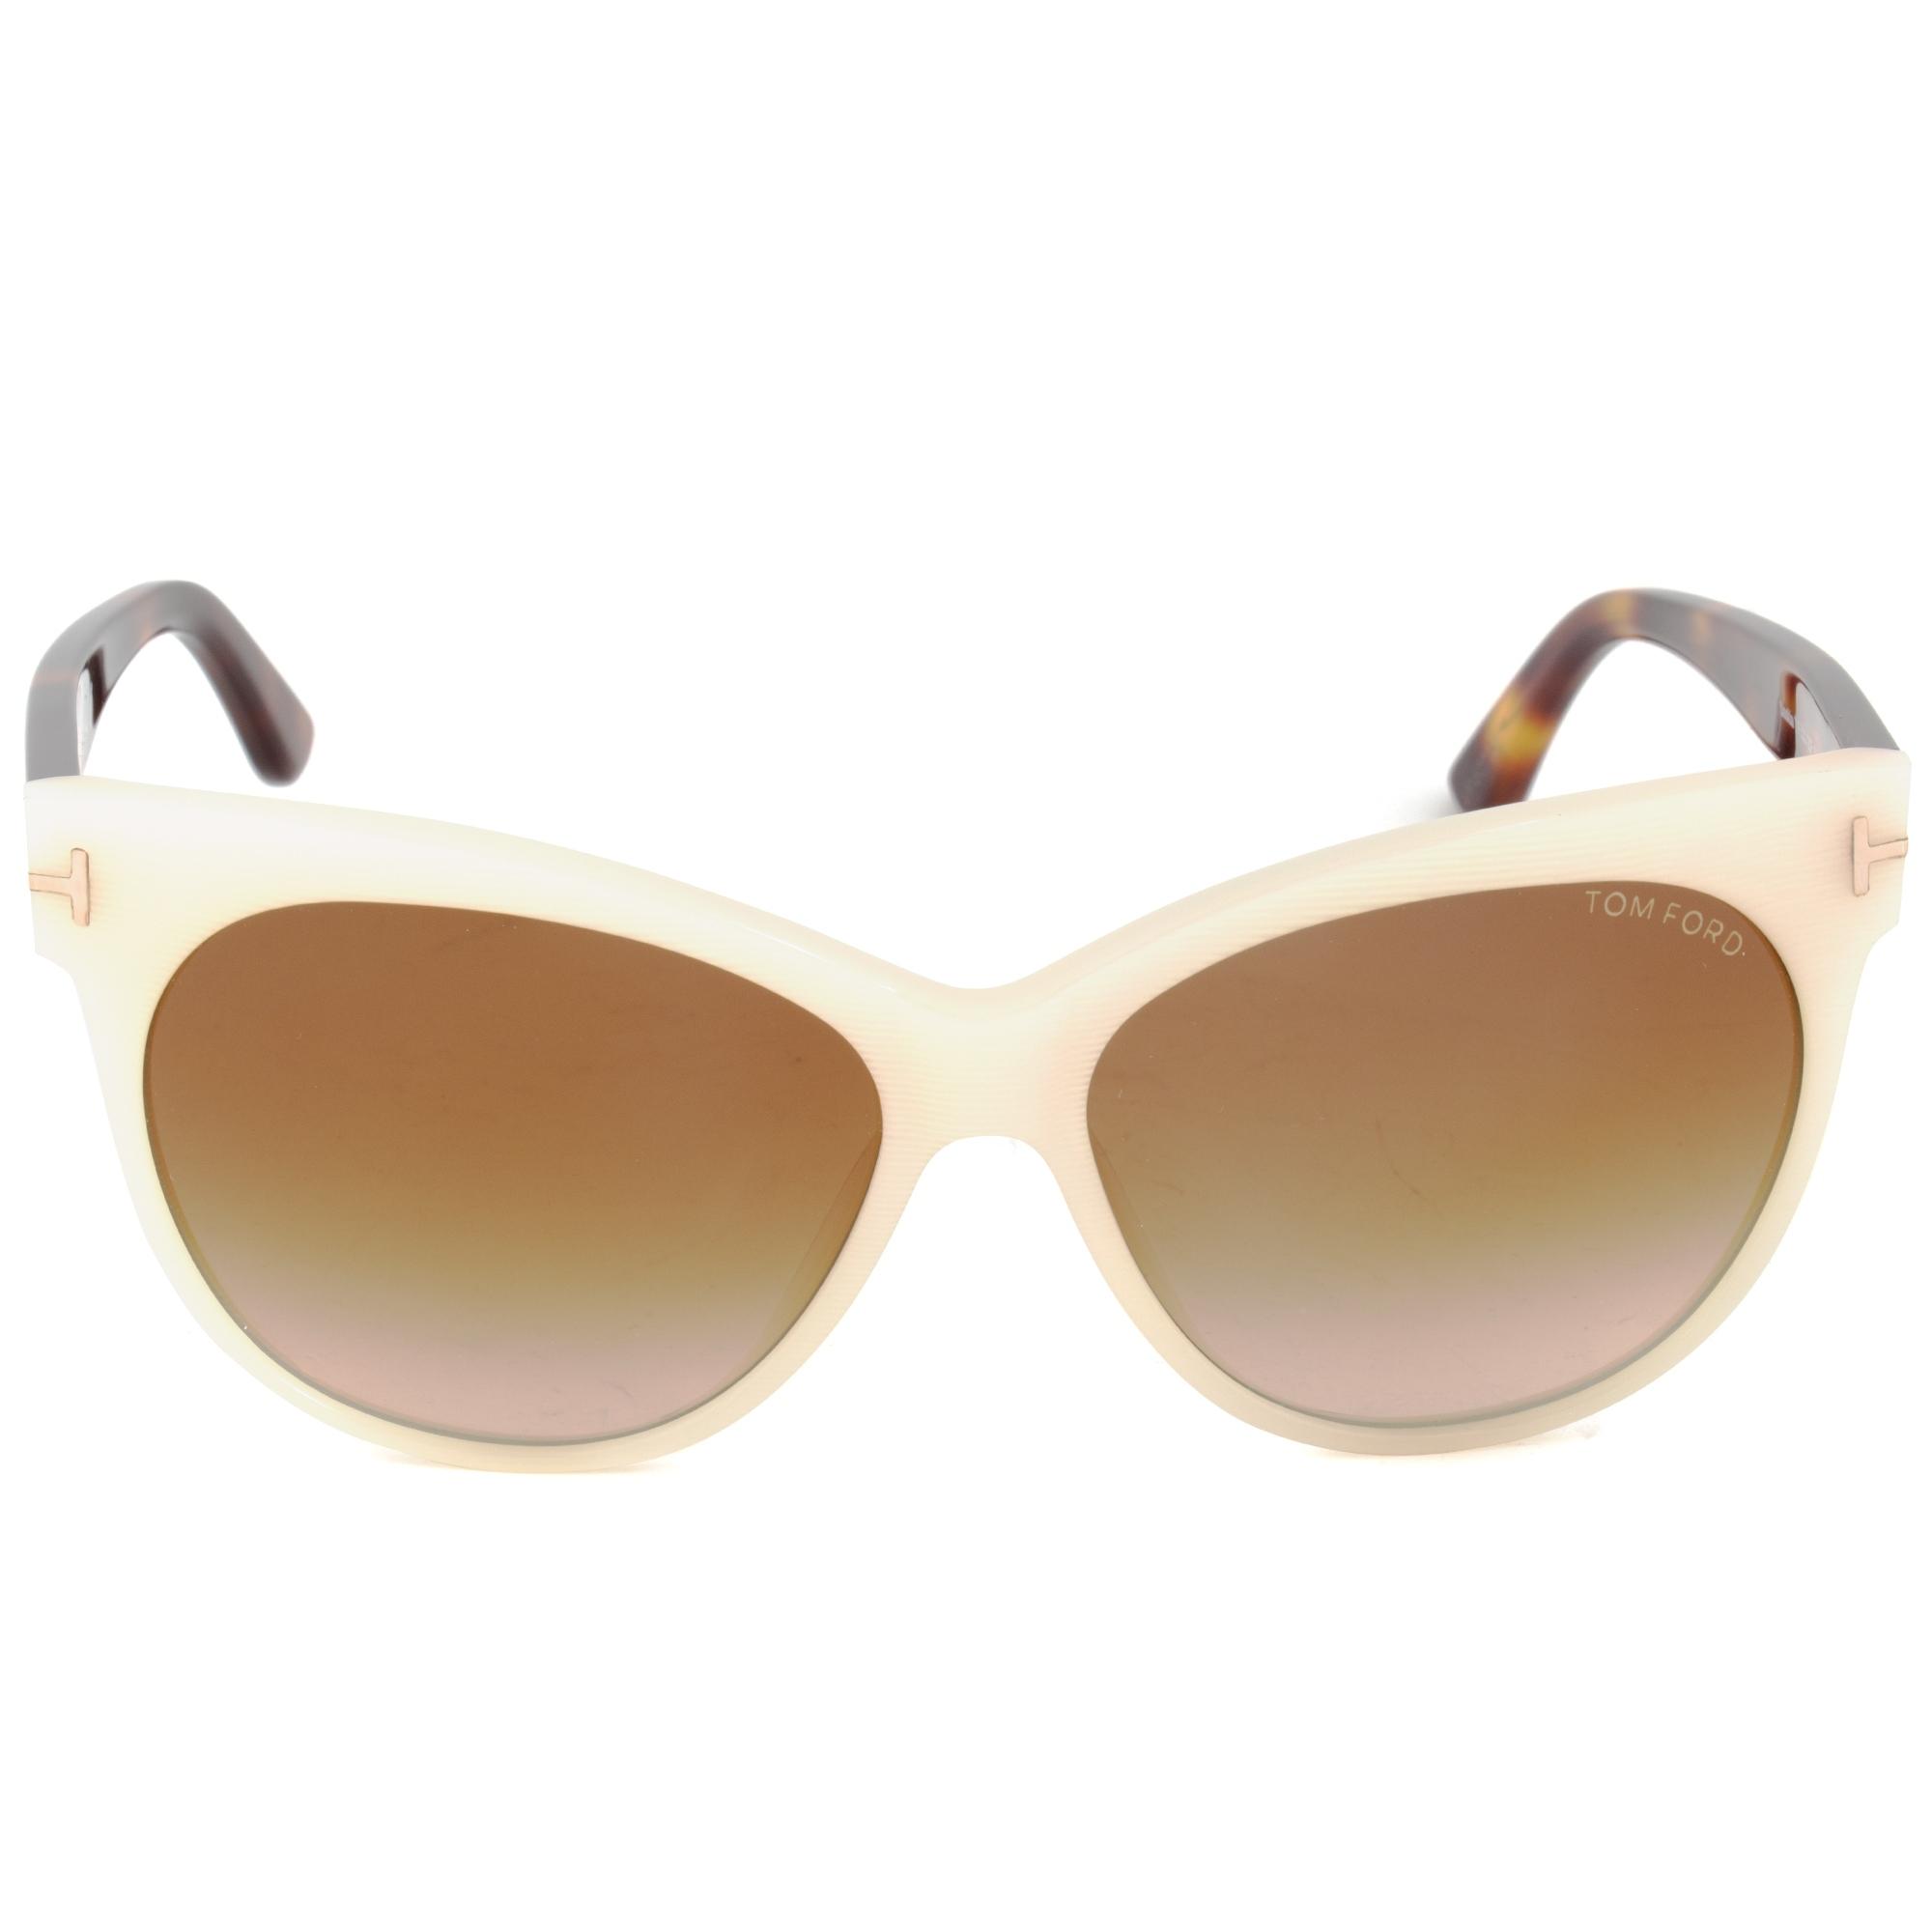 5b0f543af6fa0 Shop Tom Ford FT0330 20F Saskia sunglasses - Free Shipping Today ...